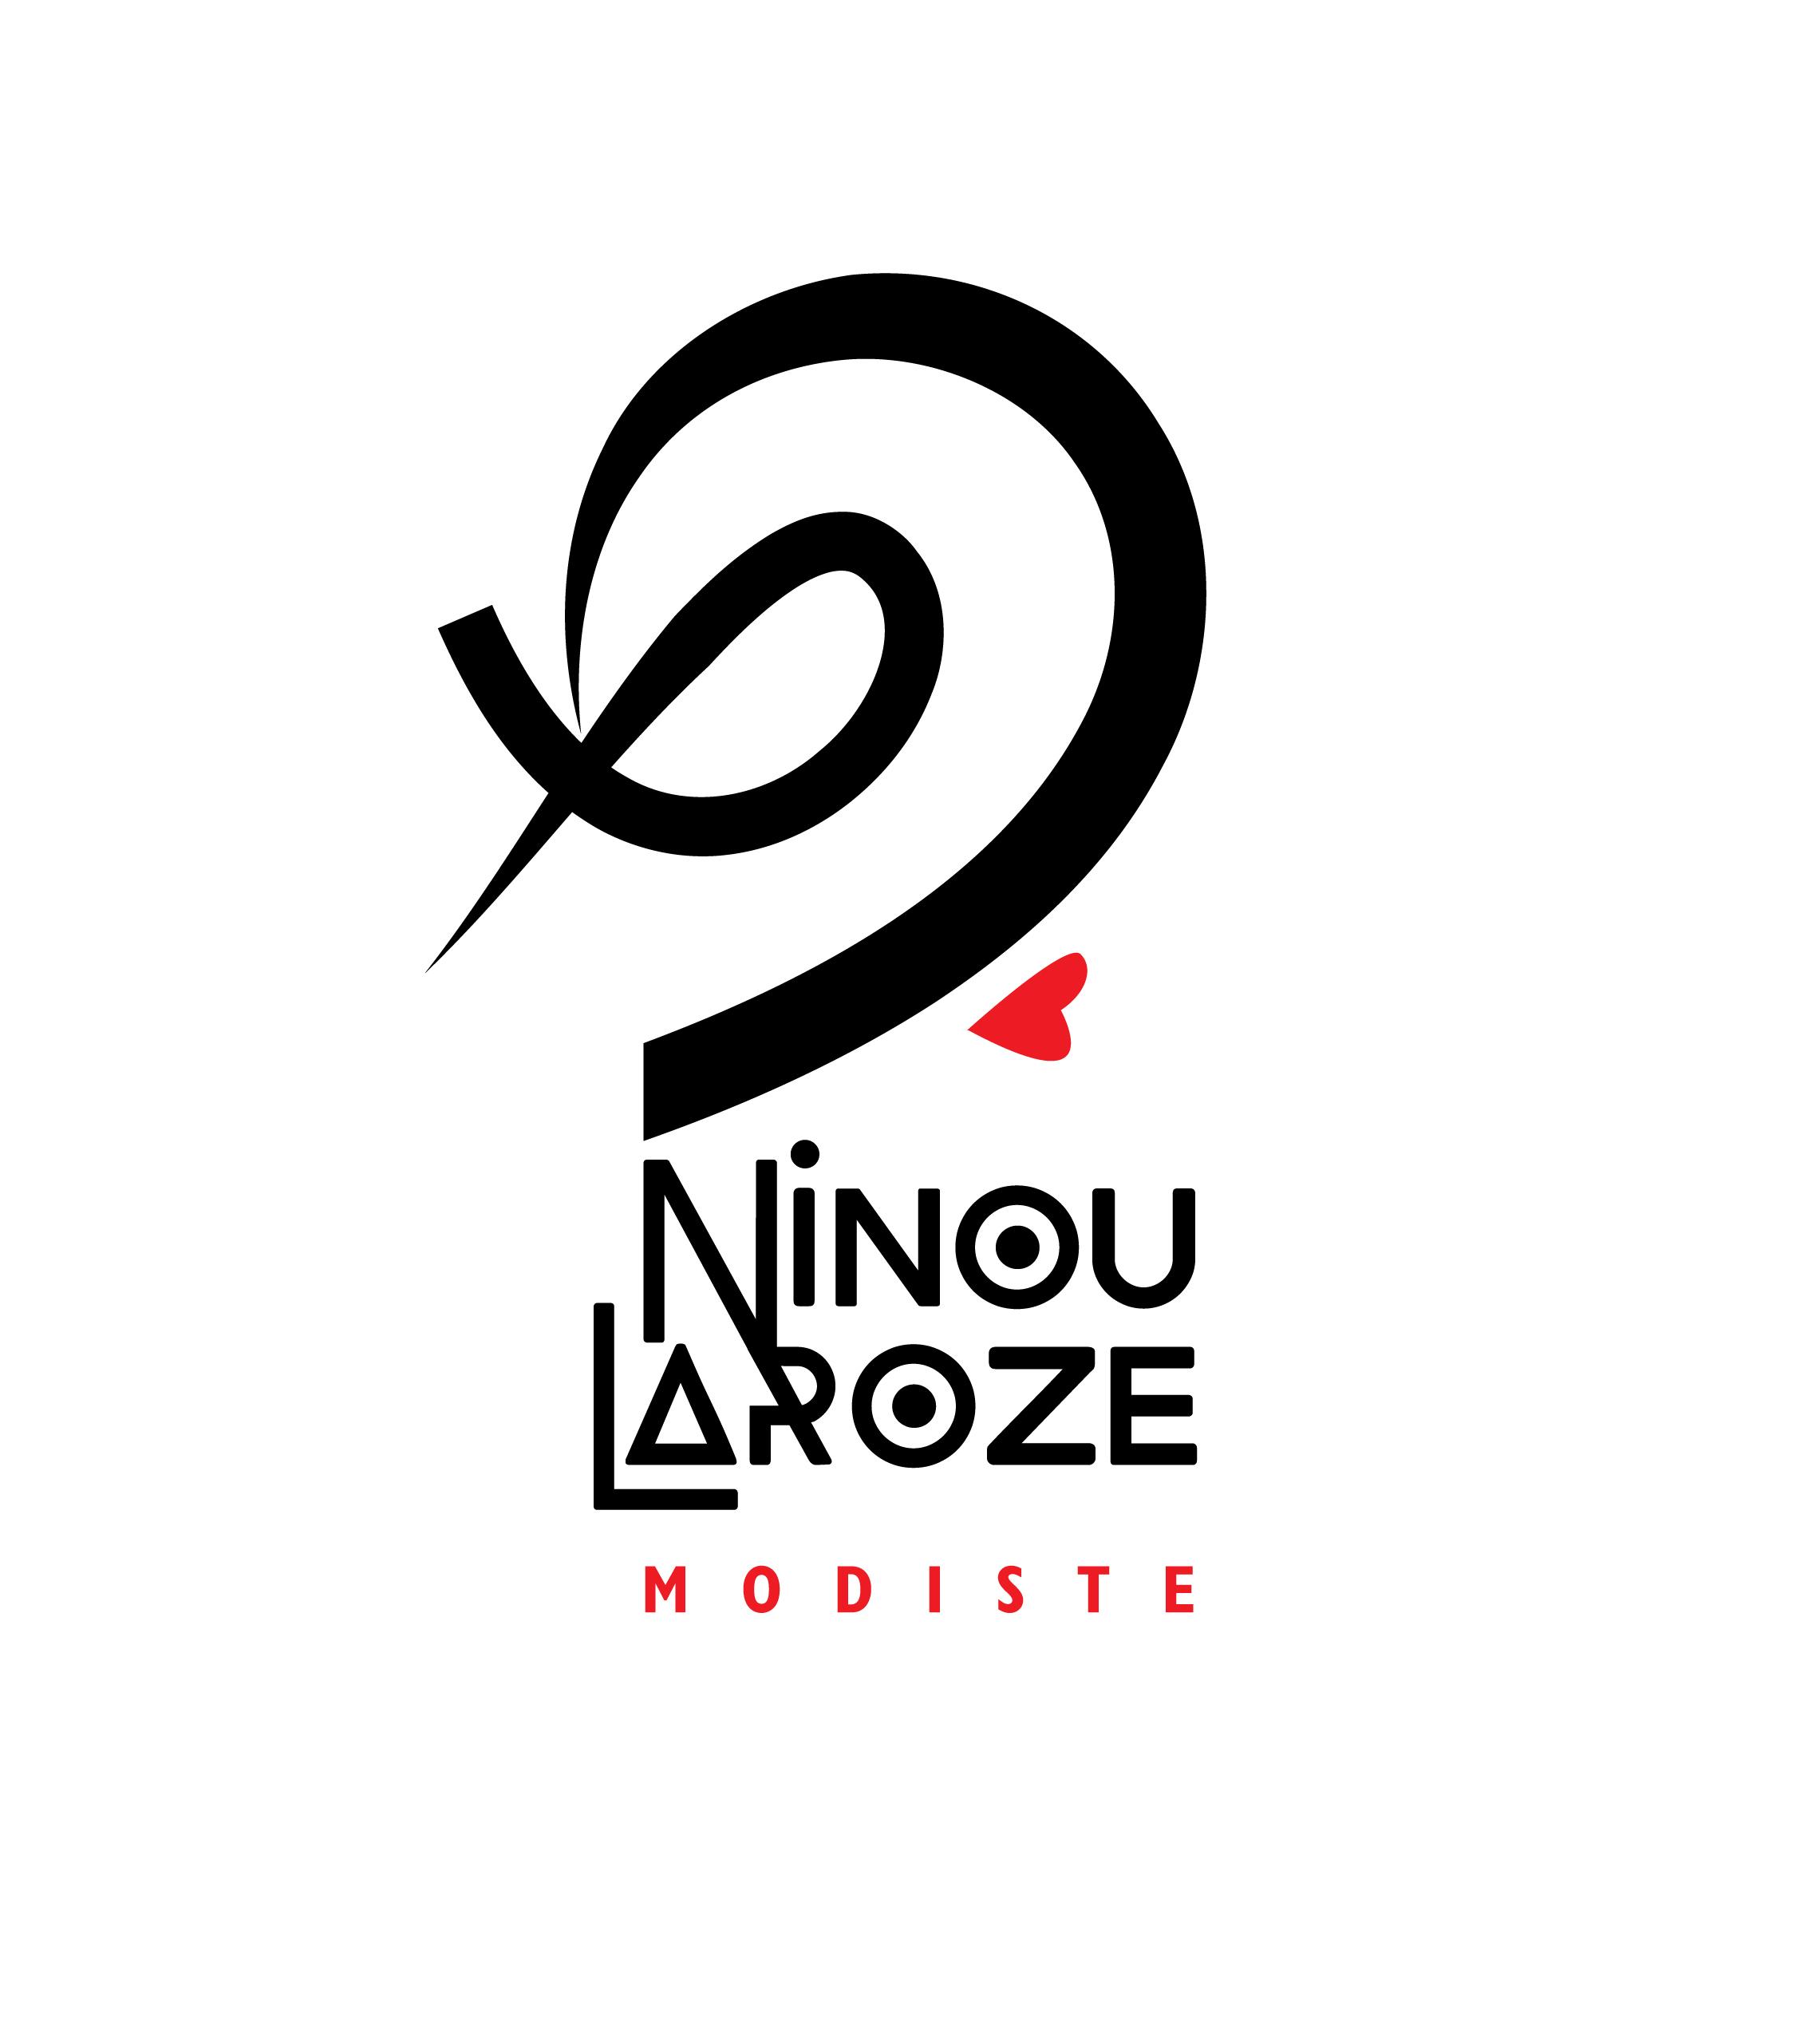 Ninou Laroze - Modiste